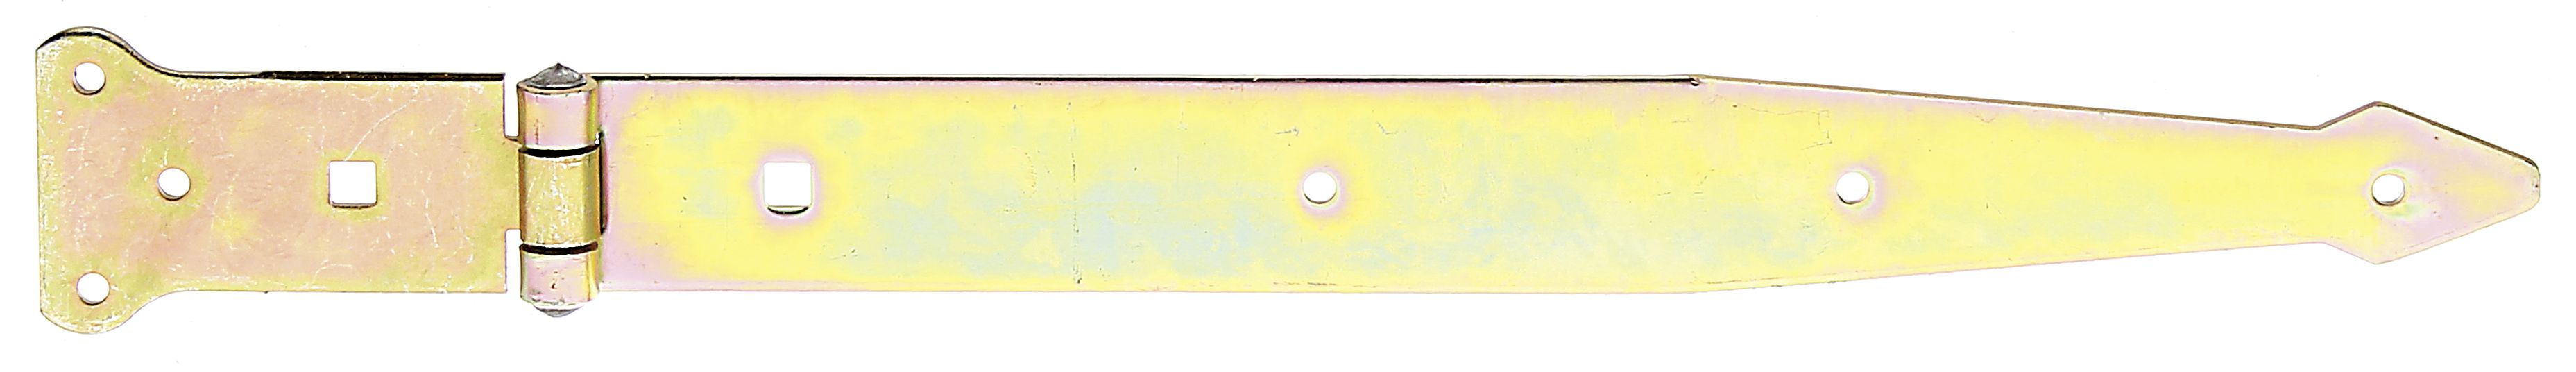 Петля для ворот,Gah Alberts, навесная, оцинкованная, 395x45 мм петля дверная gah alberts 310714